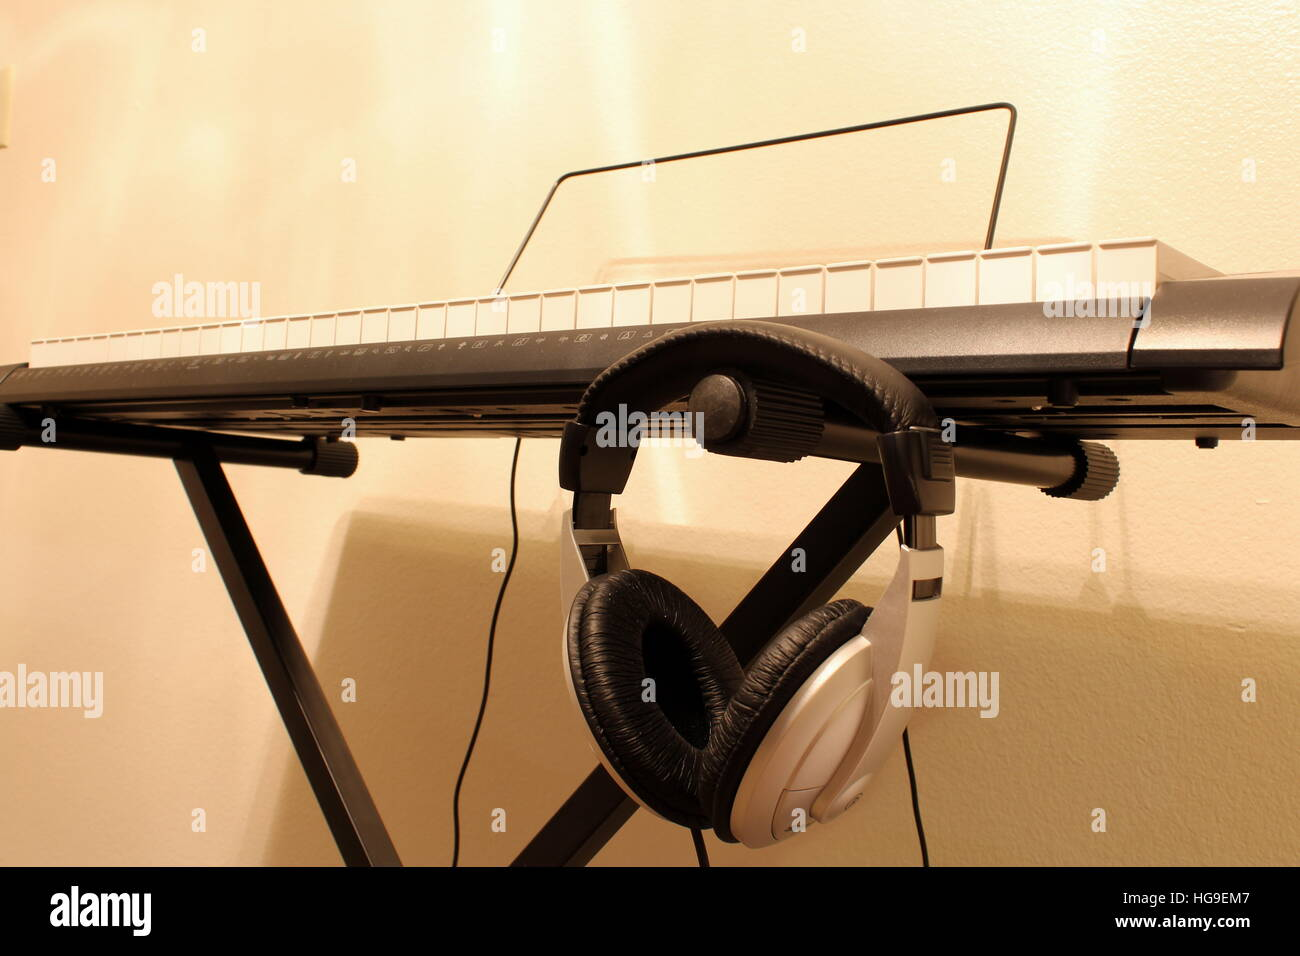 Keyboard piano with headphones - Stock Image